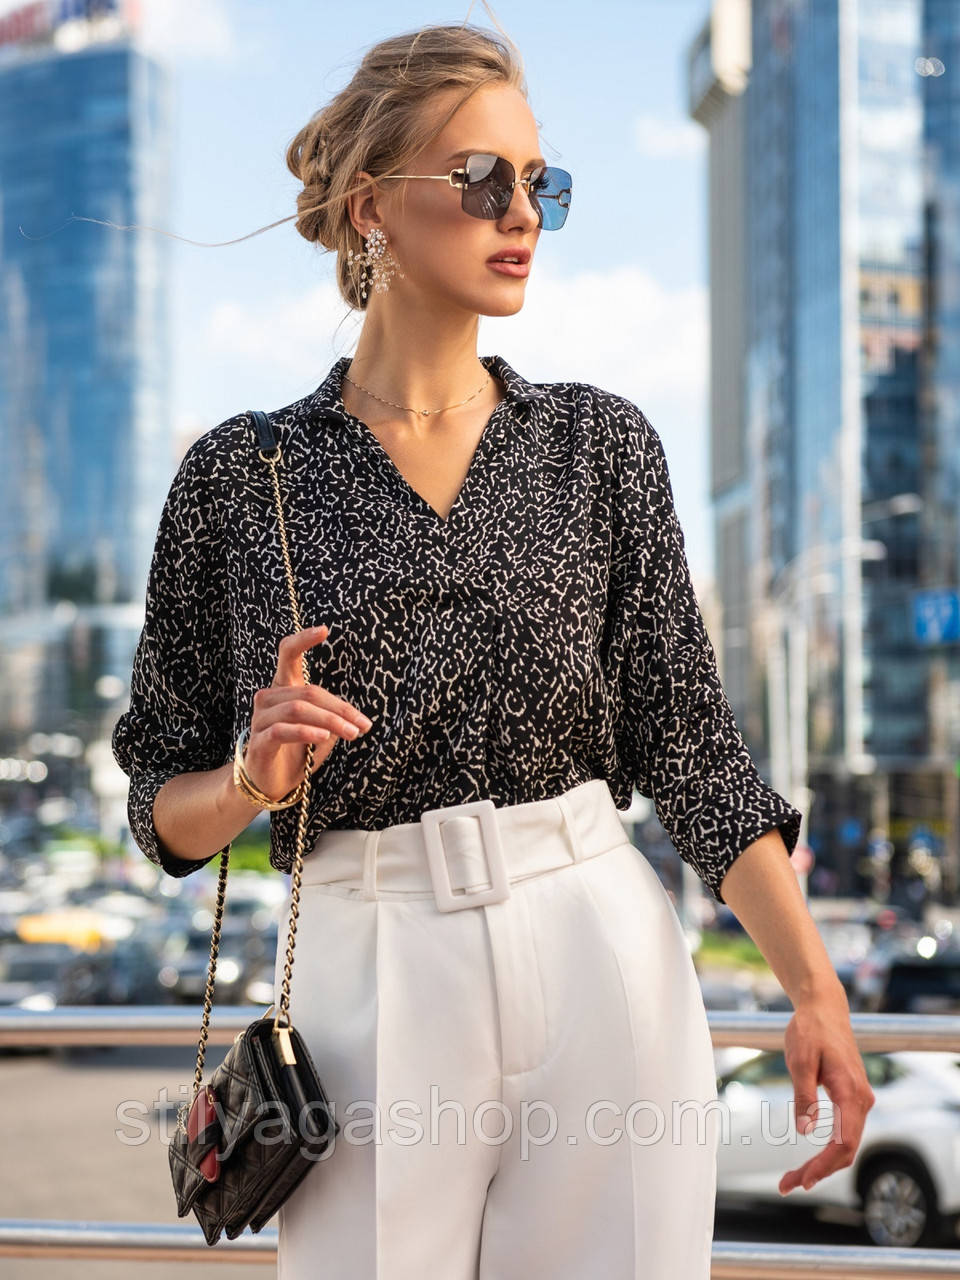 Черная блузка прямого кроя с рукавом три четверти